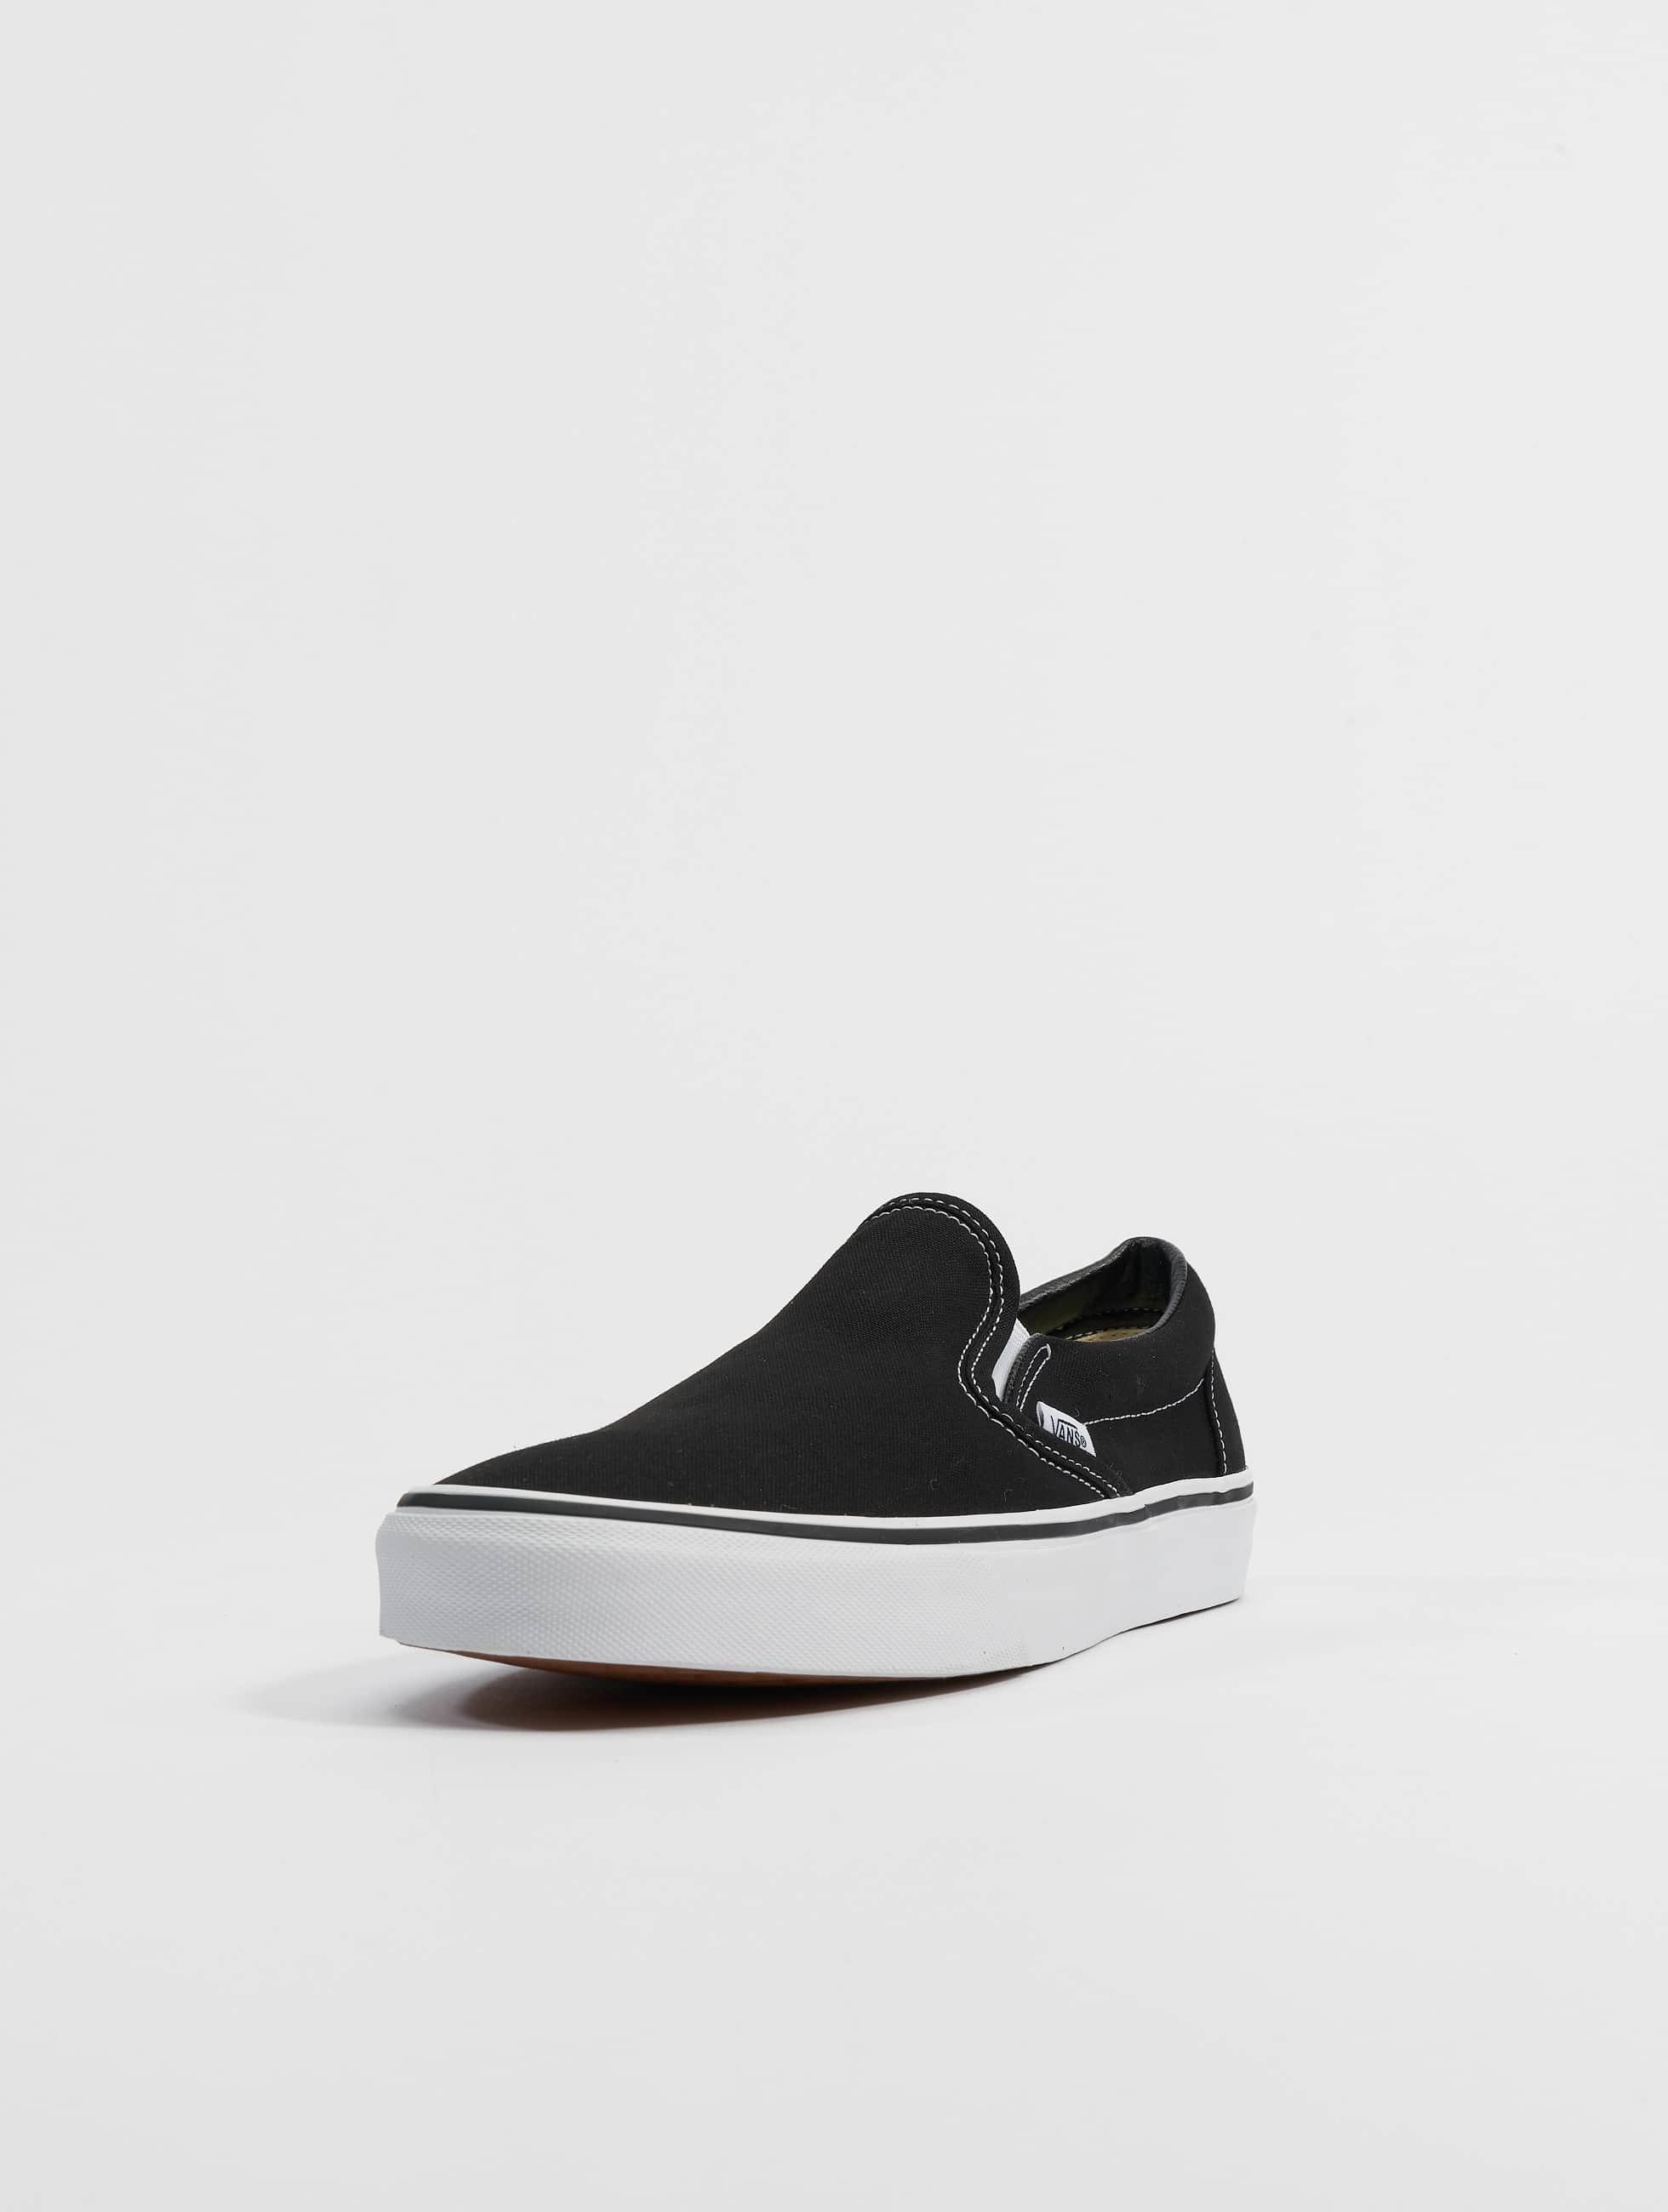 Vans Baskets Classic Slip-On noir